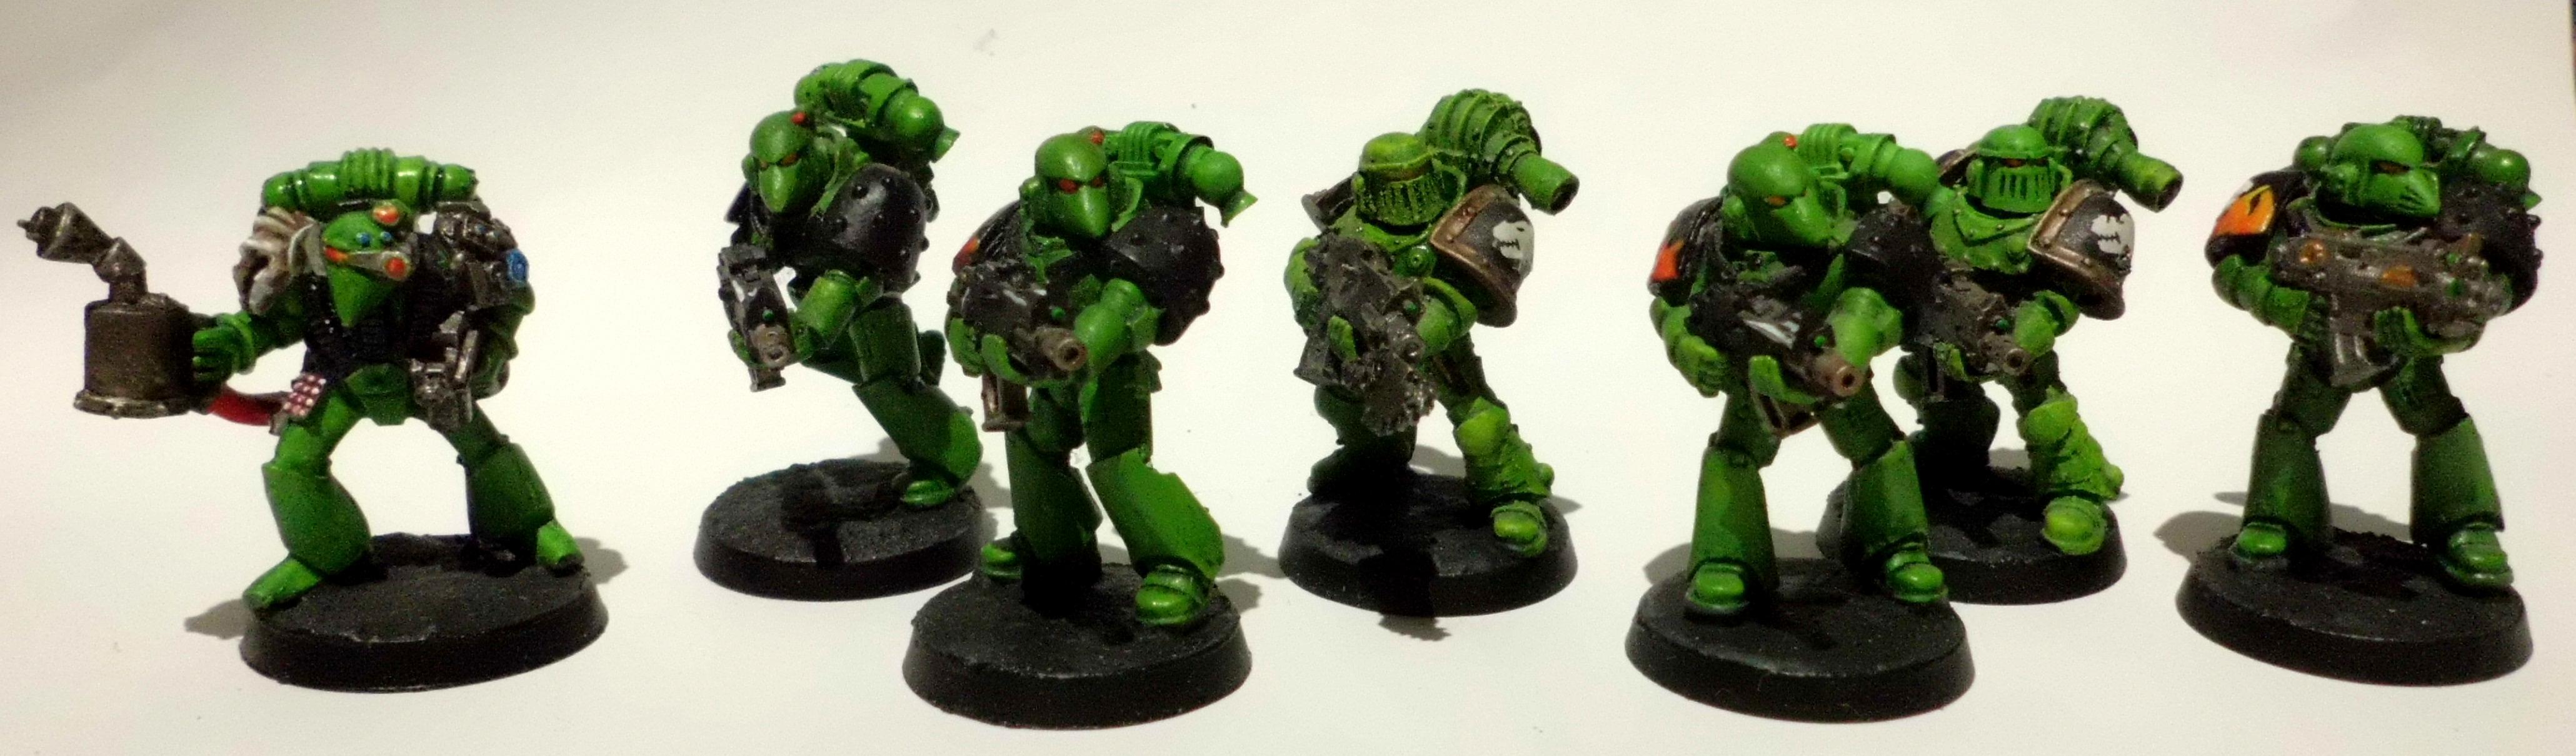 30k, Heavy Flamer, Horus Heresy, Isstvan 5, Legion Marines, Salamanders, Suspensor Web, Veteran Tactical Squad